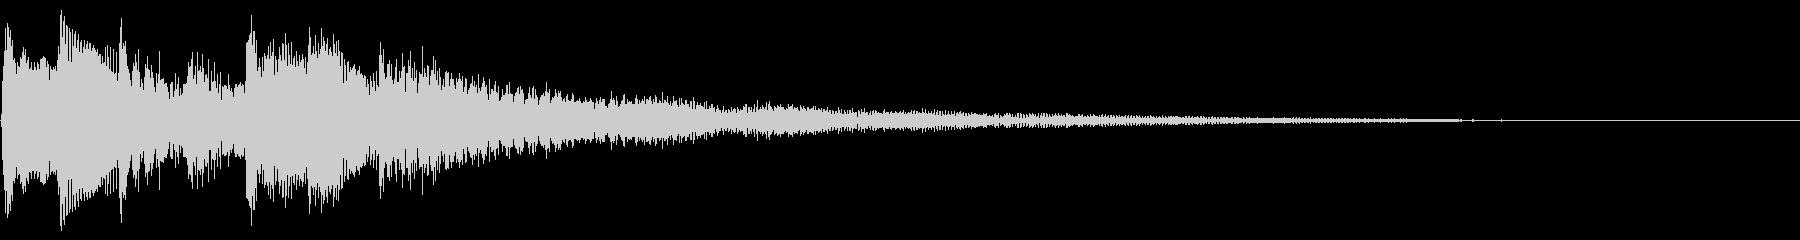 Refreshing arpeggio nylon guitar's unreproduced waveform